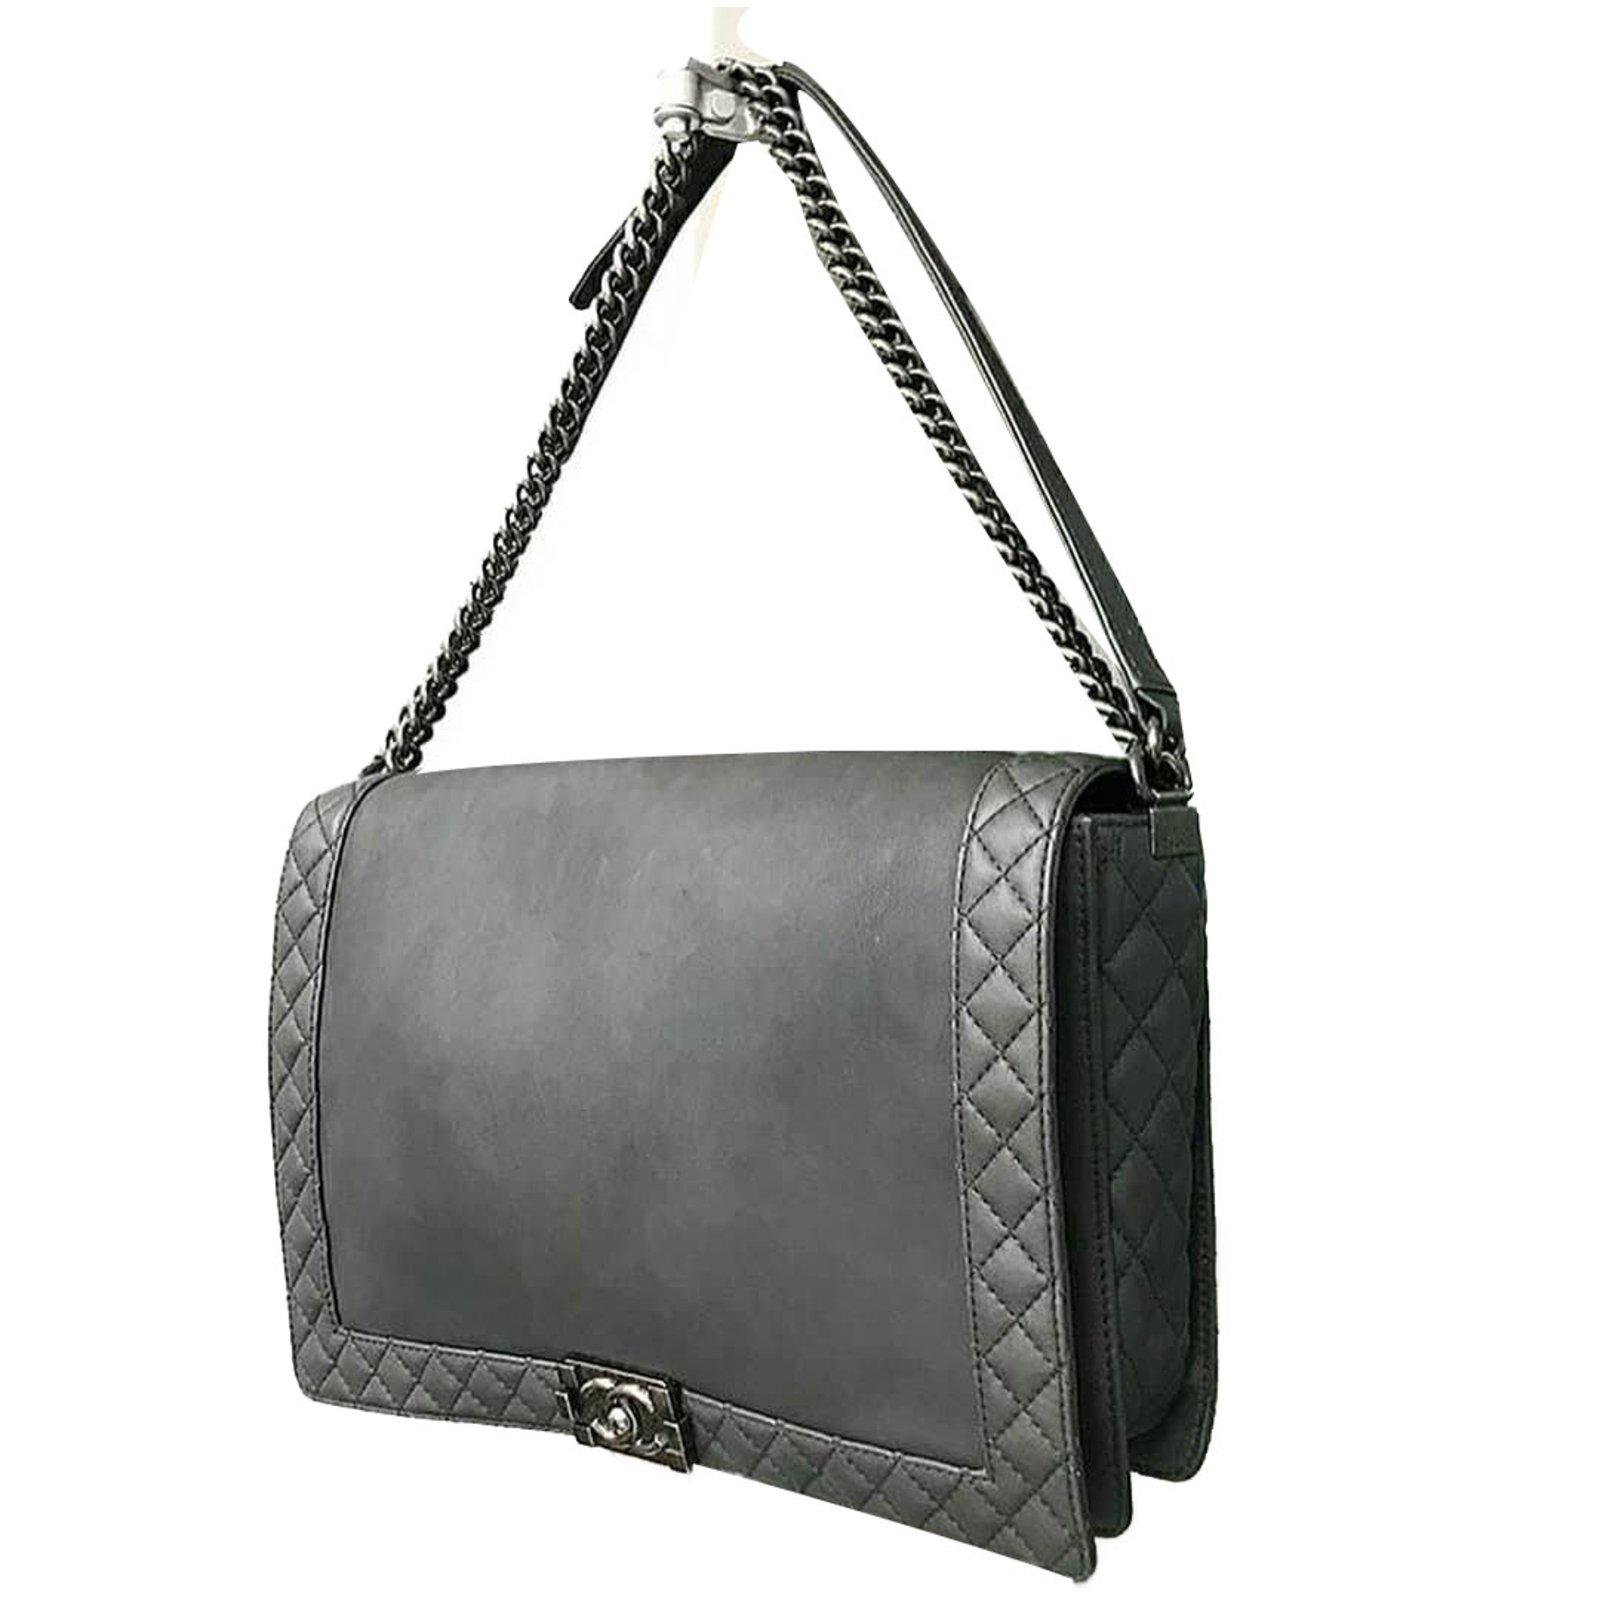 8198aff2e723 Chanel The Boy large Handbags Leather Grey ref.71568 - Joli Closet